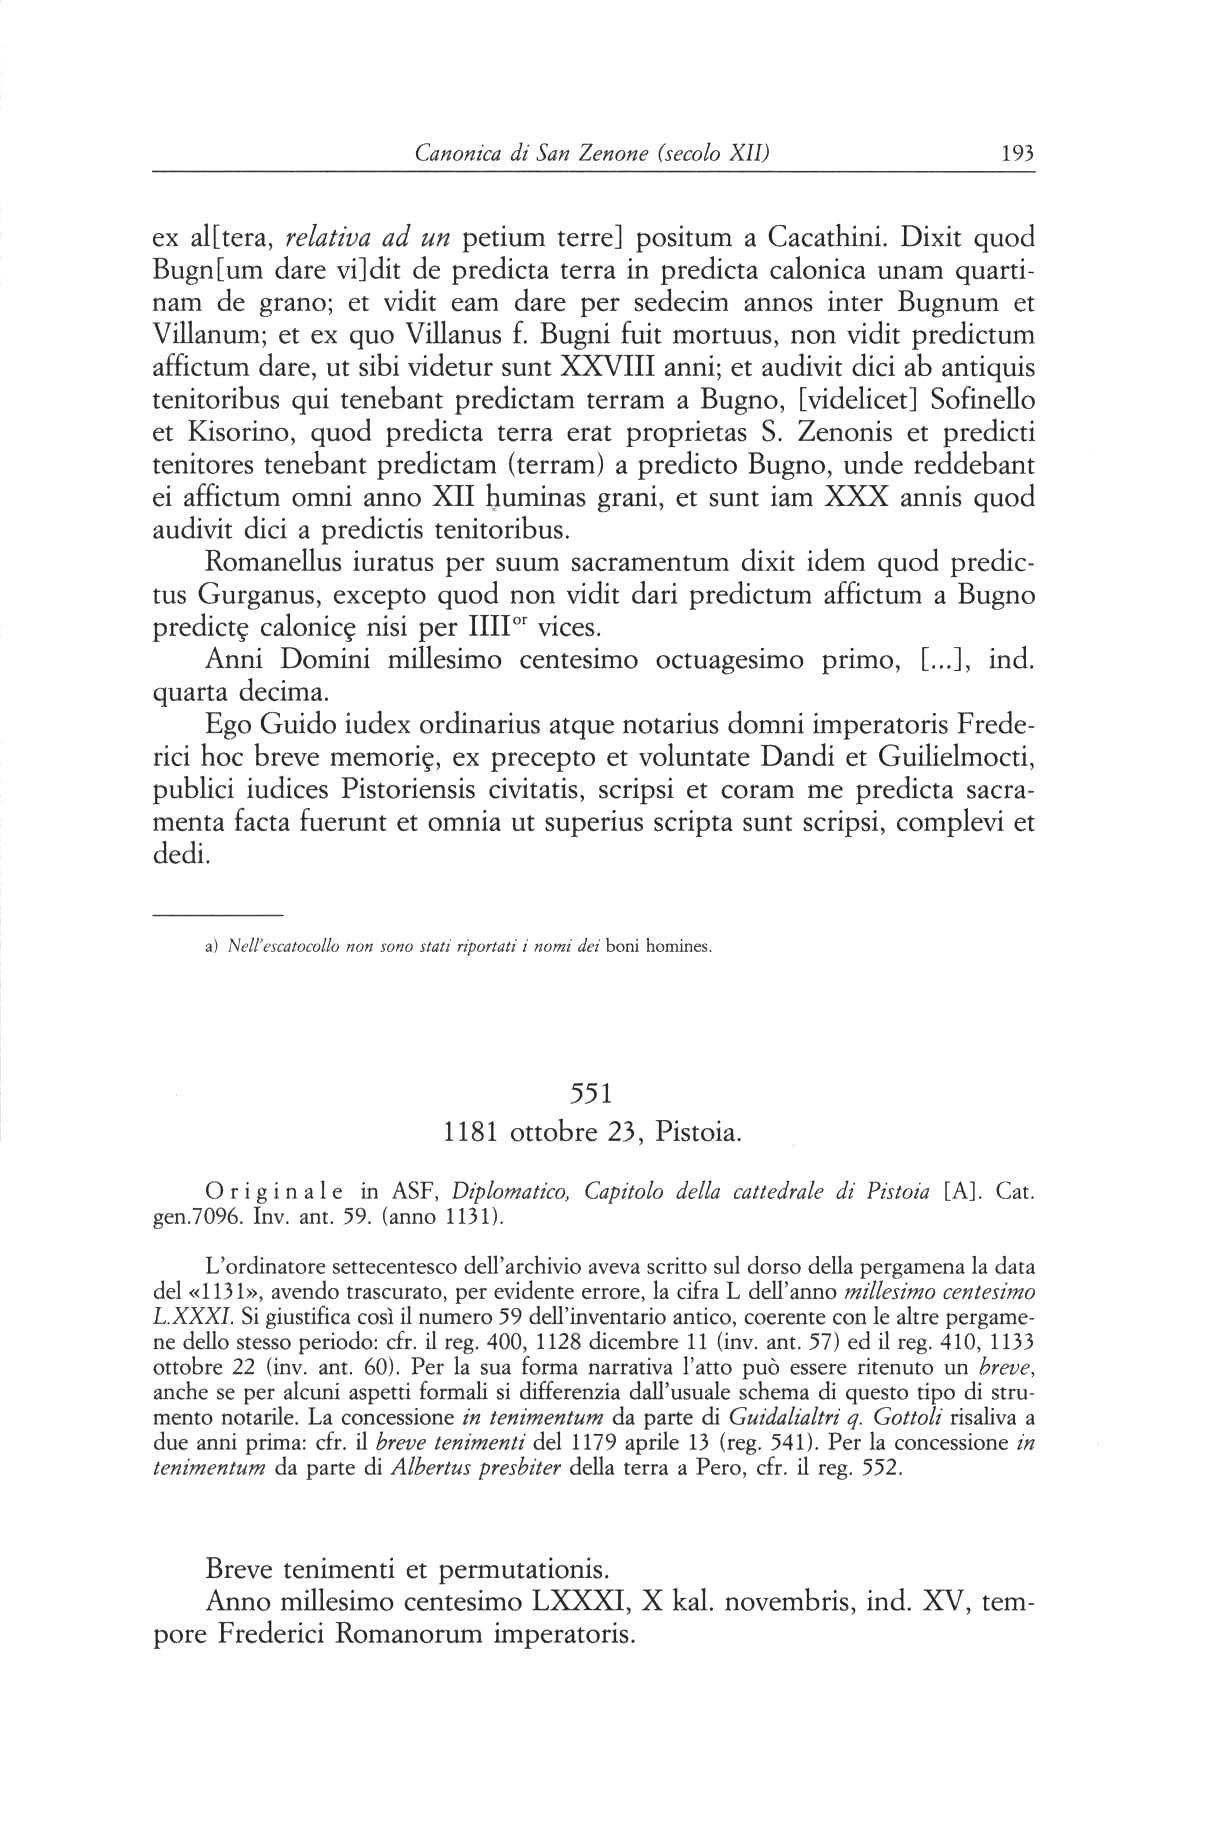 Canonica S. Zenone XII 0193.jpg